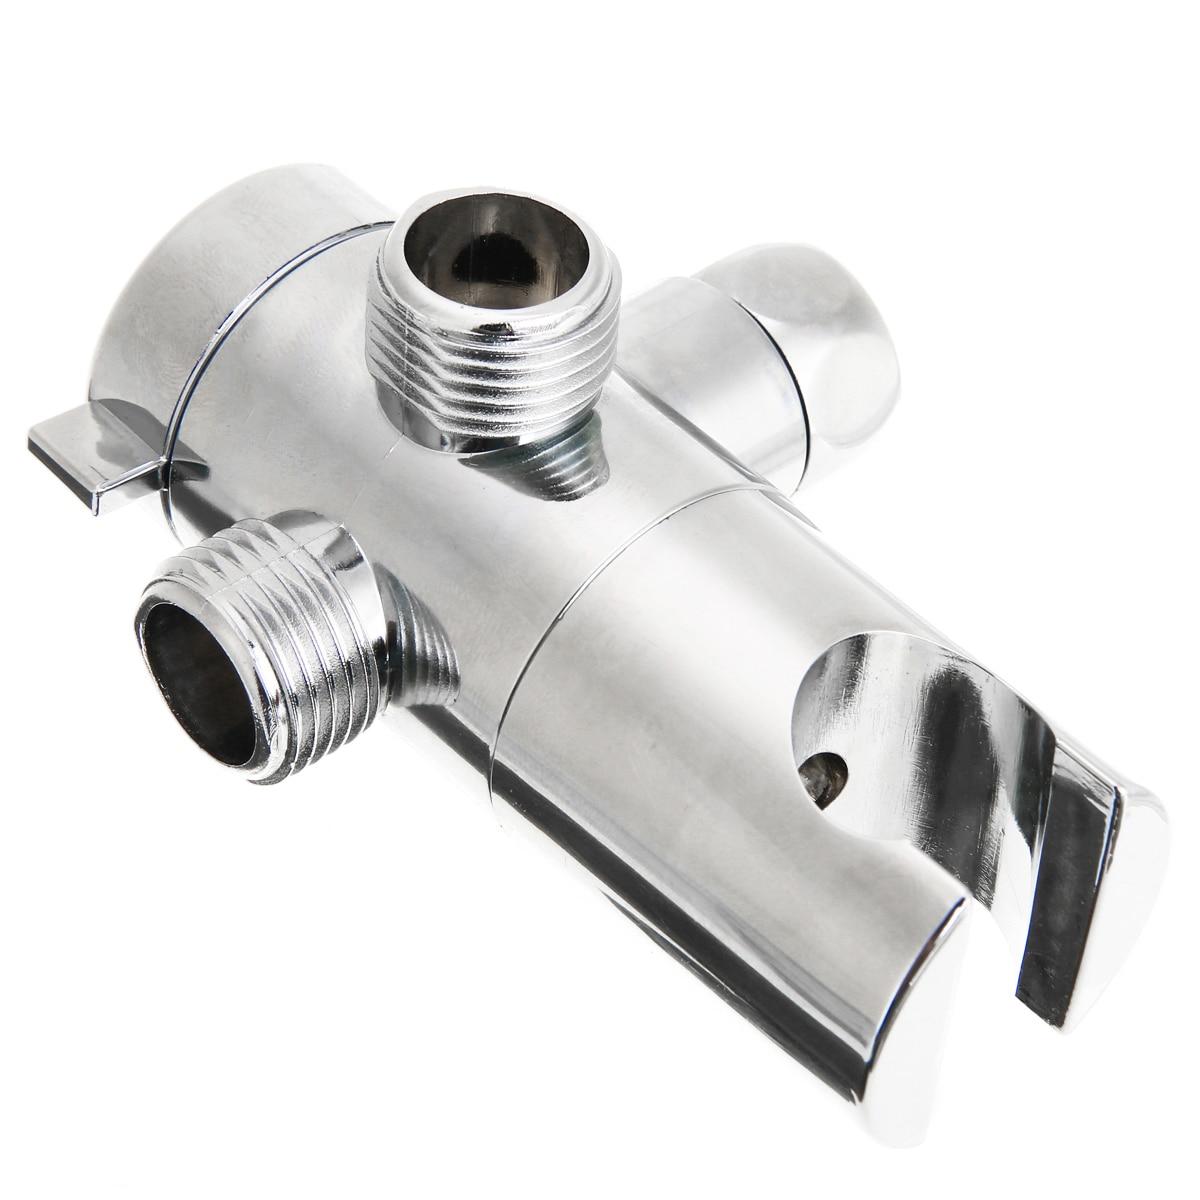 Holder 3-Way Valve Shower Head Diverter Bathroom Sprayer Arm Mount Electroplatin